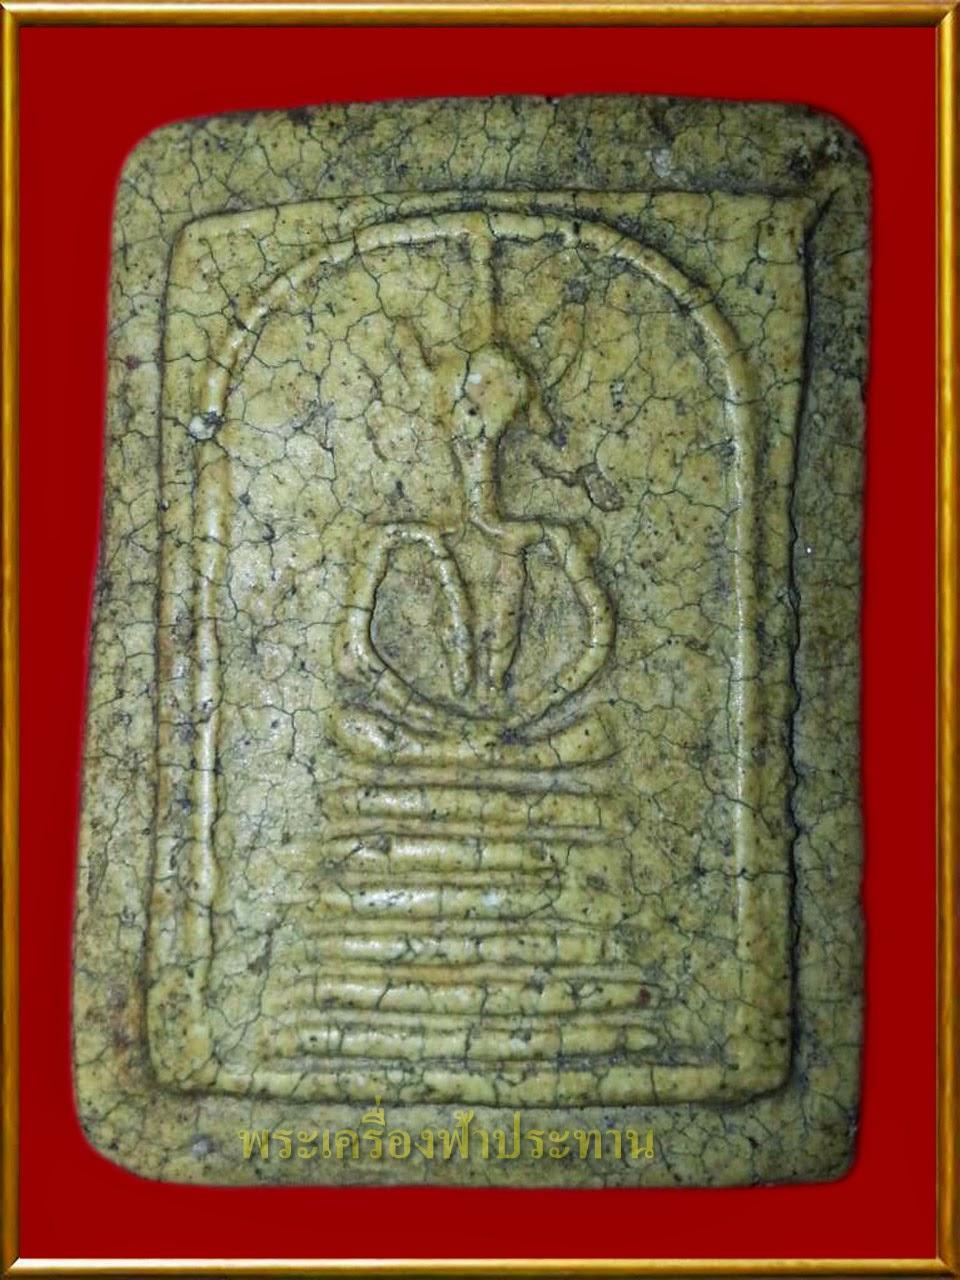 http://tubtimthong-amulet.blogspot.com/2014/11/6.html